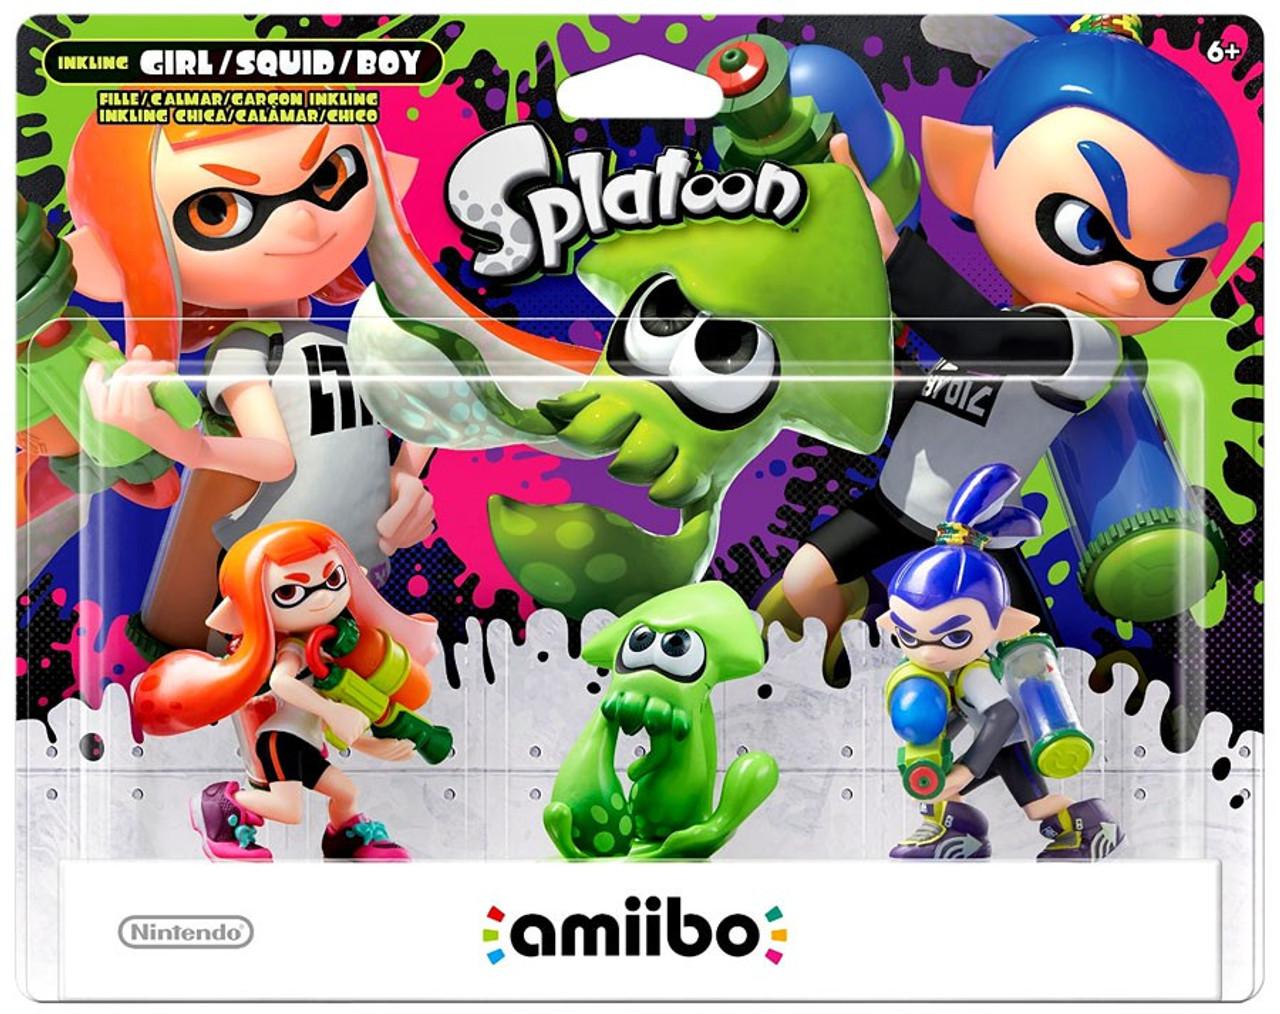 Nintendo Splatoon Amiibo Inkling Girl Squid Boy Mini Figure 3 Pack